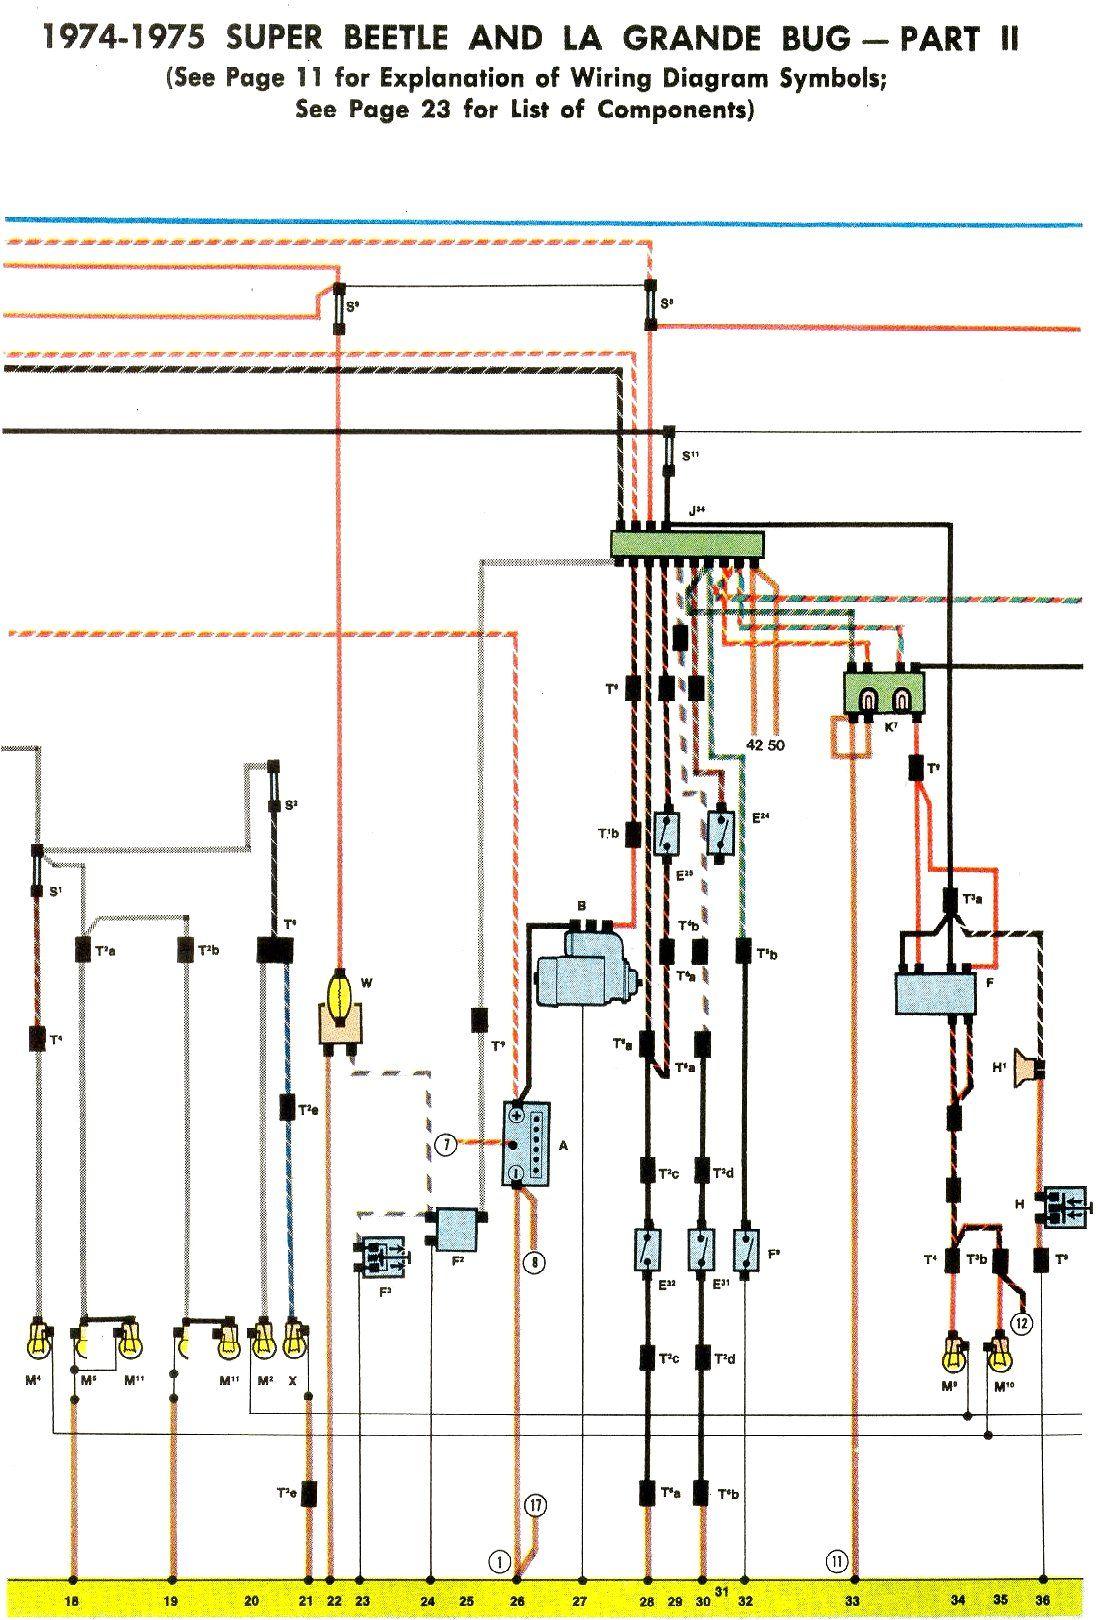 1974-75 Super Beetle Wiring Diagram | TheGoldenBug.com | Diagram, Beetle,  Tactical truck | 75 Vw Bus Wiring Diagrams |  | Pinterest